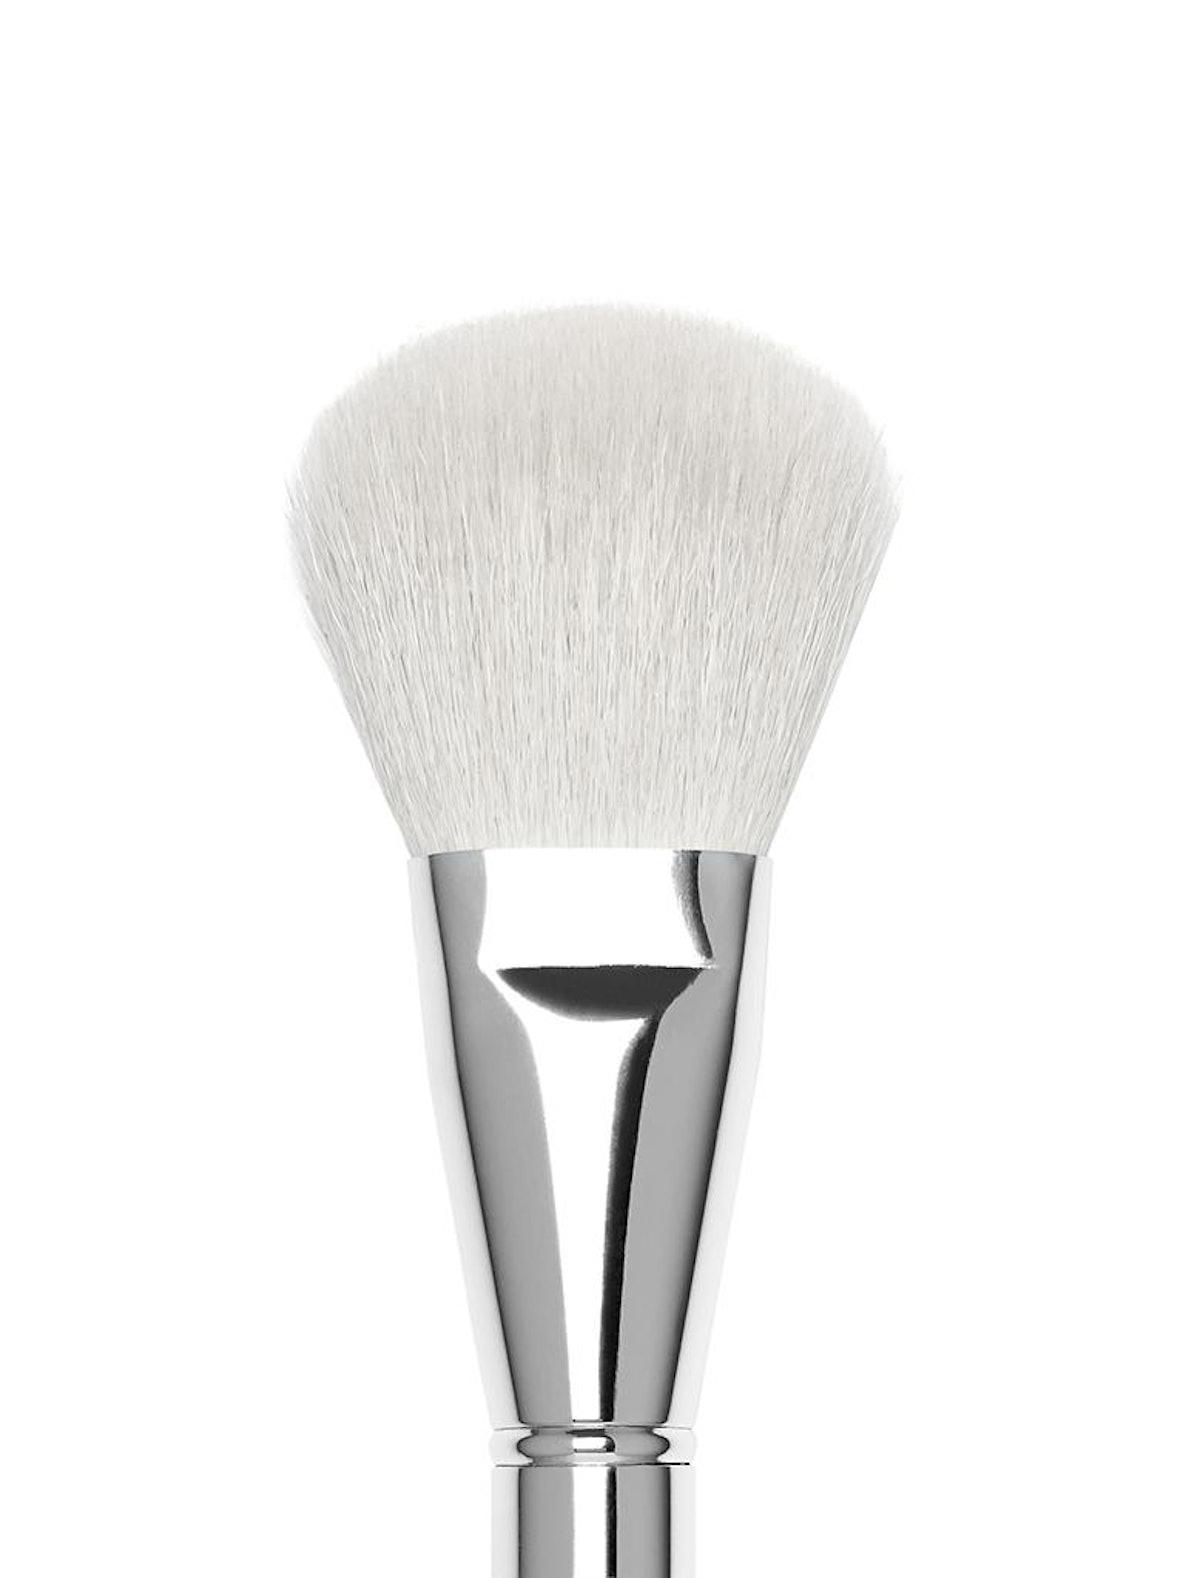 #1 Large Powder Brush